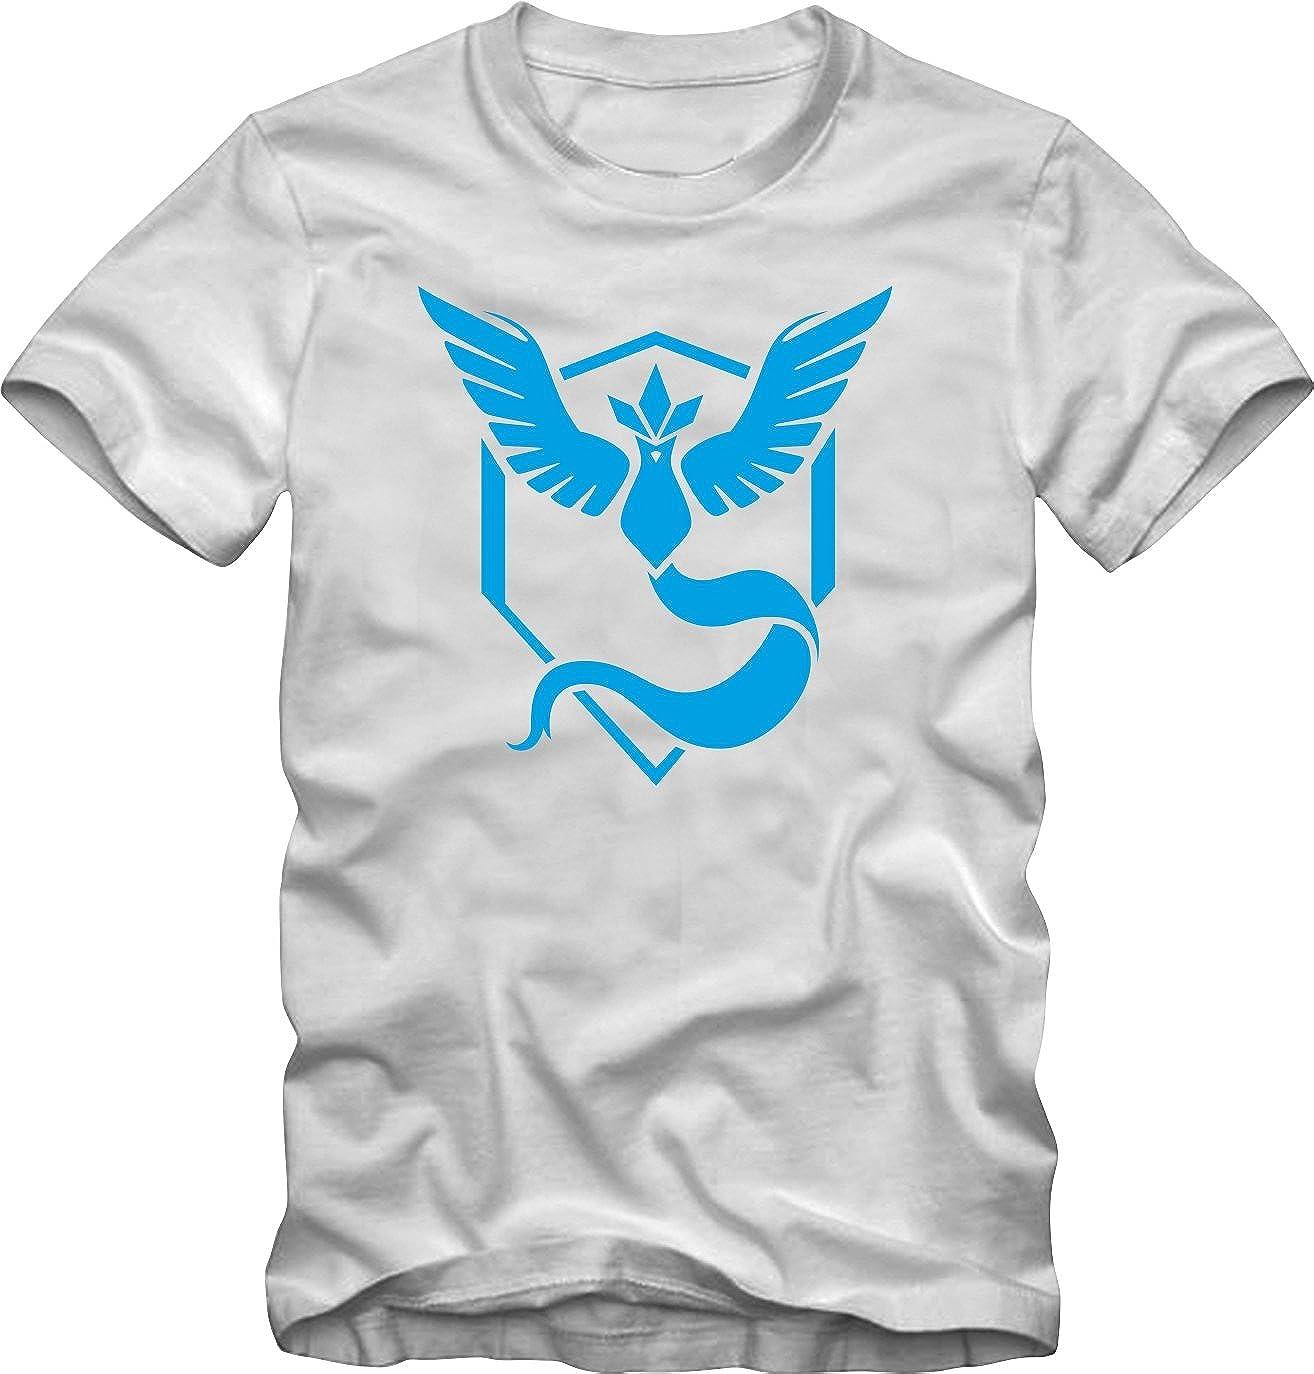 Bisura T-Shirt Pokemon Go Team Mystic